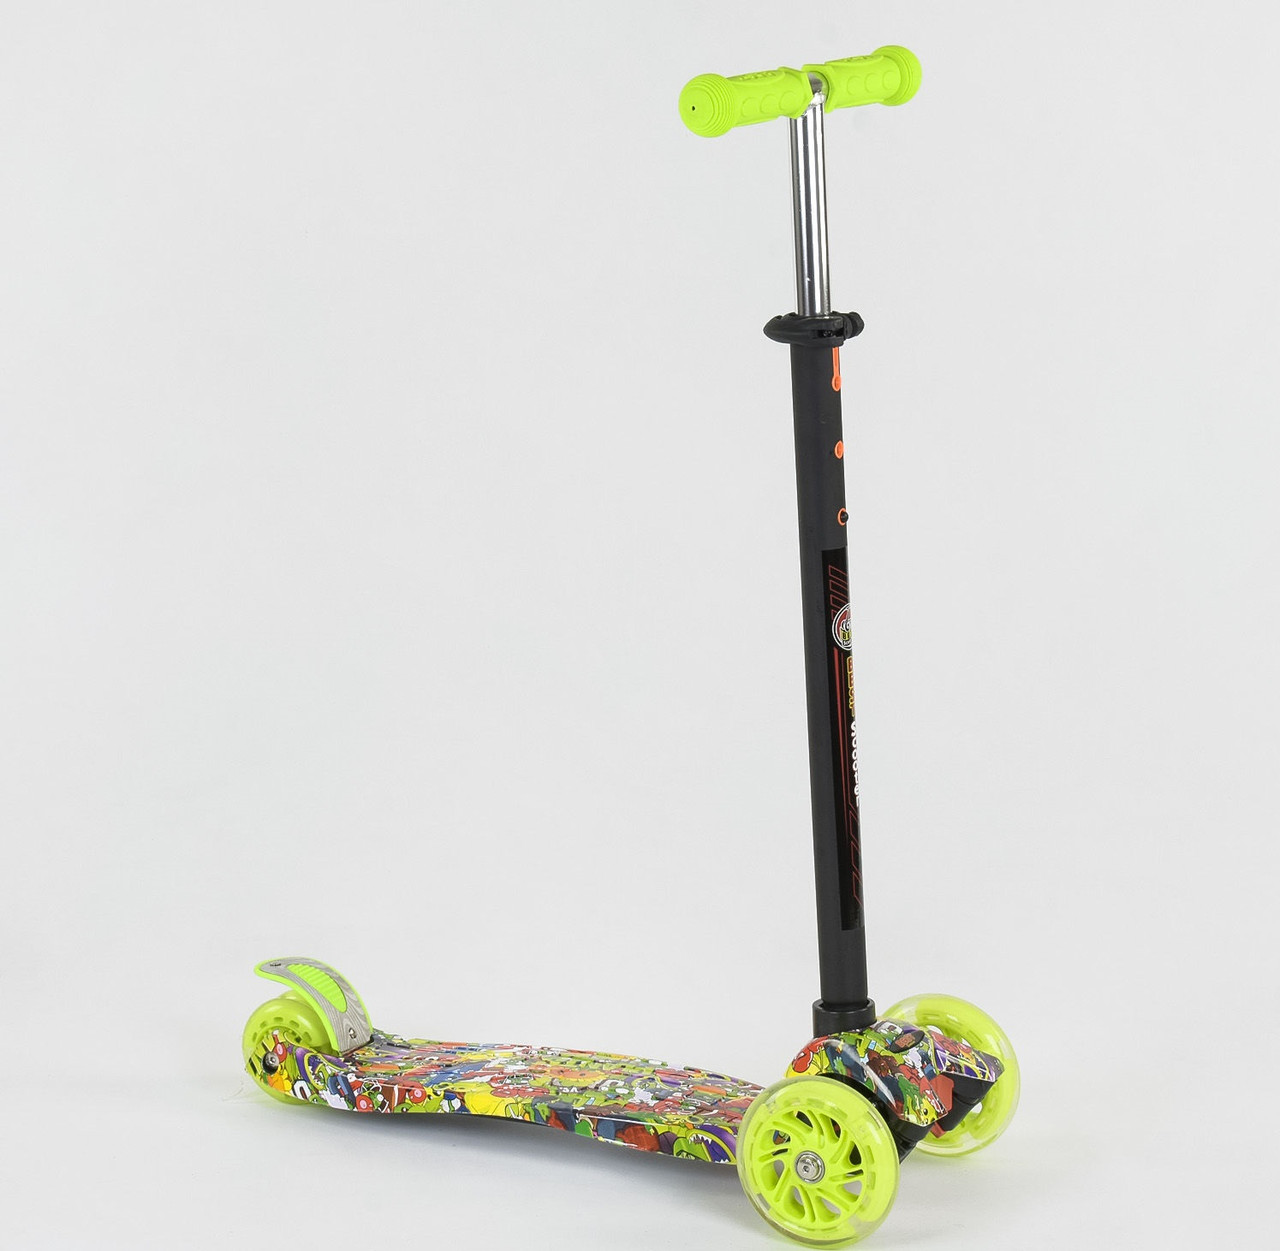 Самокат Best Scooter Maxi A 25534 /779-1332 Бест Скутер Макси